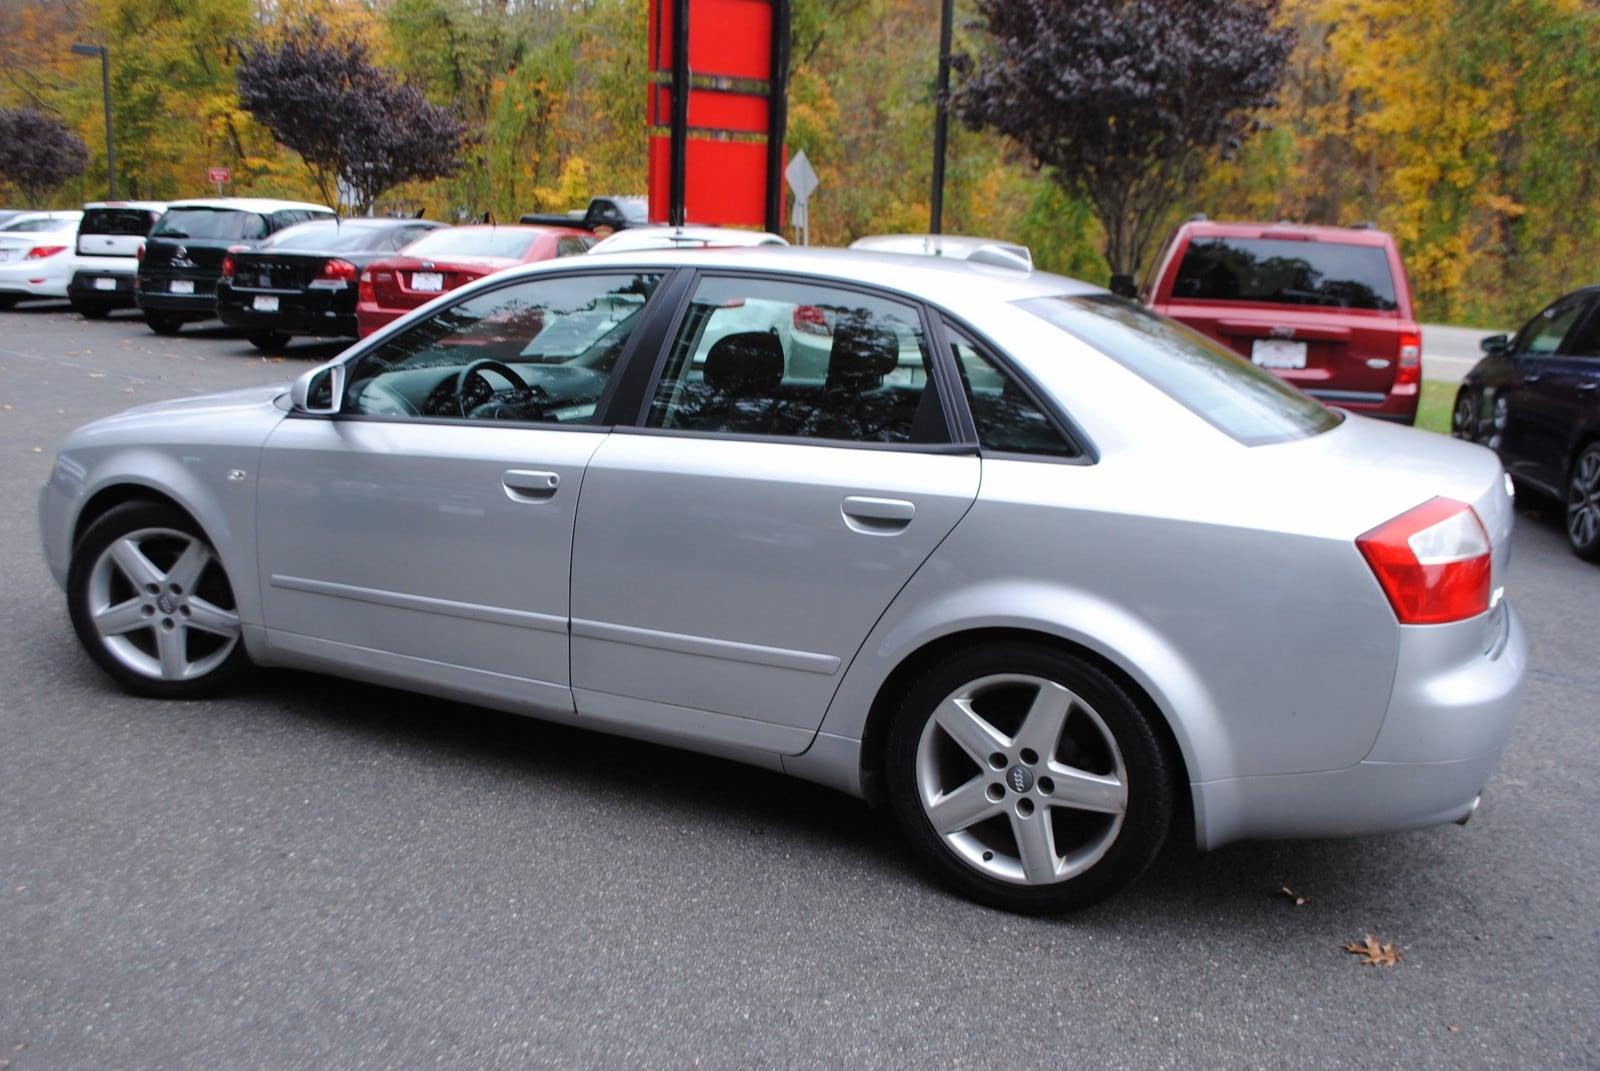 used 2004 audi a4 for sale west milford nj rh ramseycorp com 2009 Audi A4 2014 Audi A4